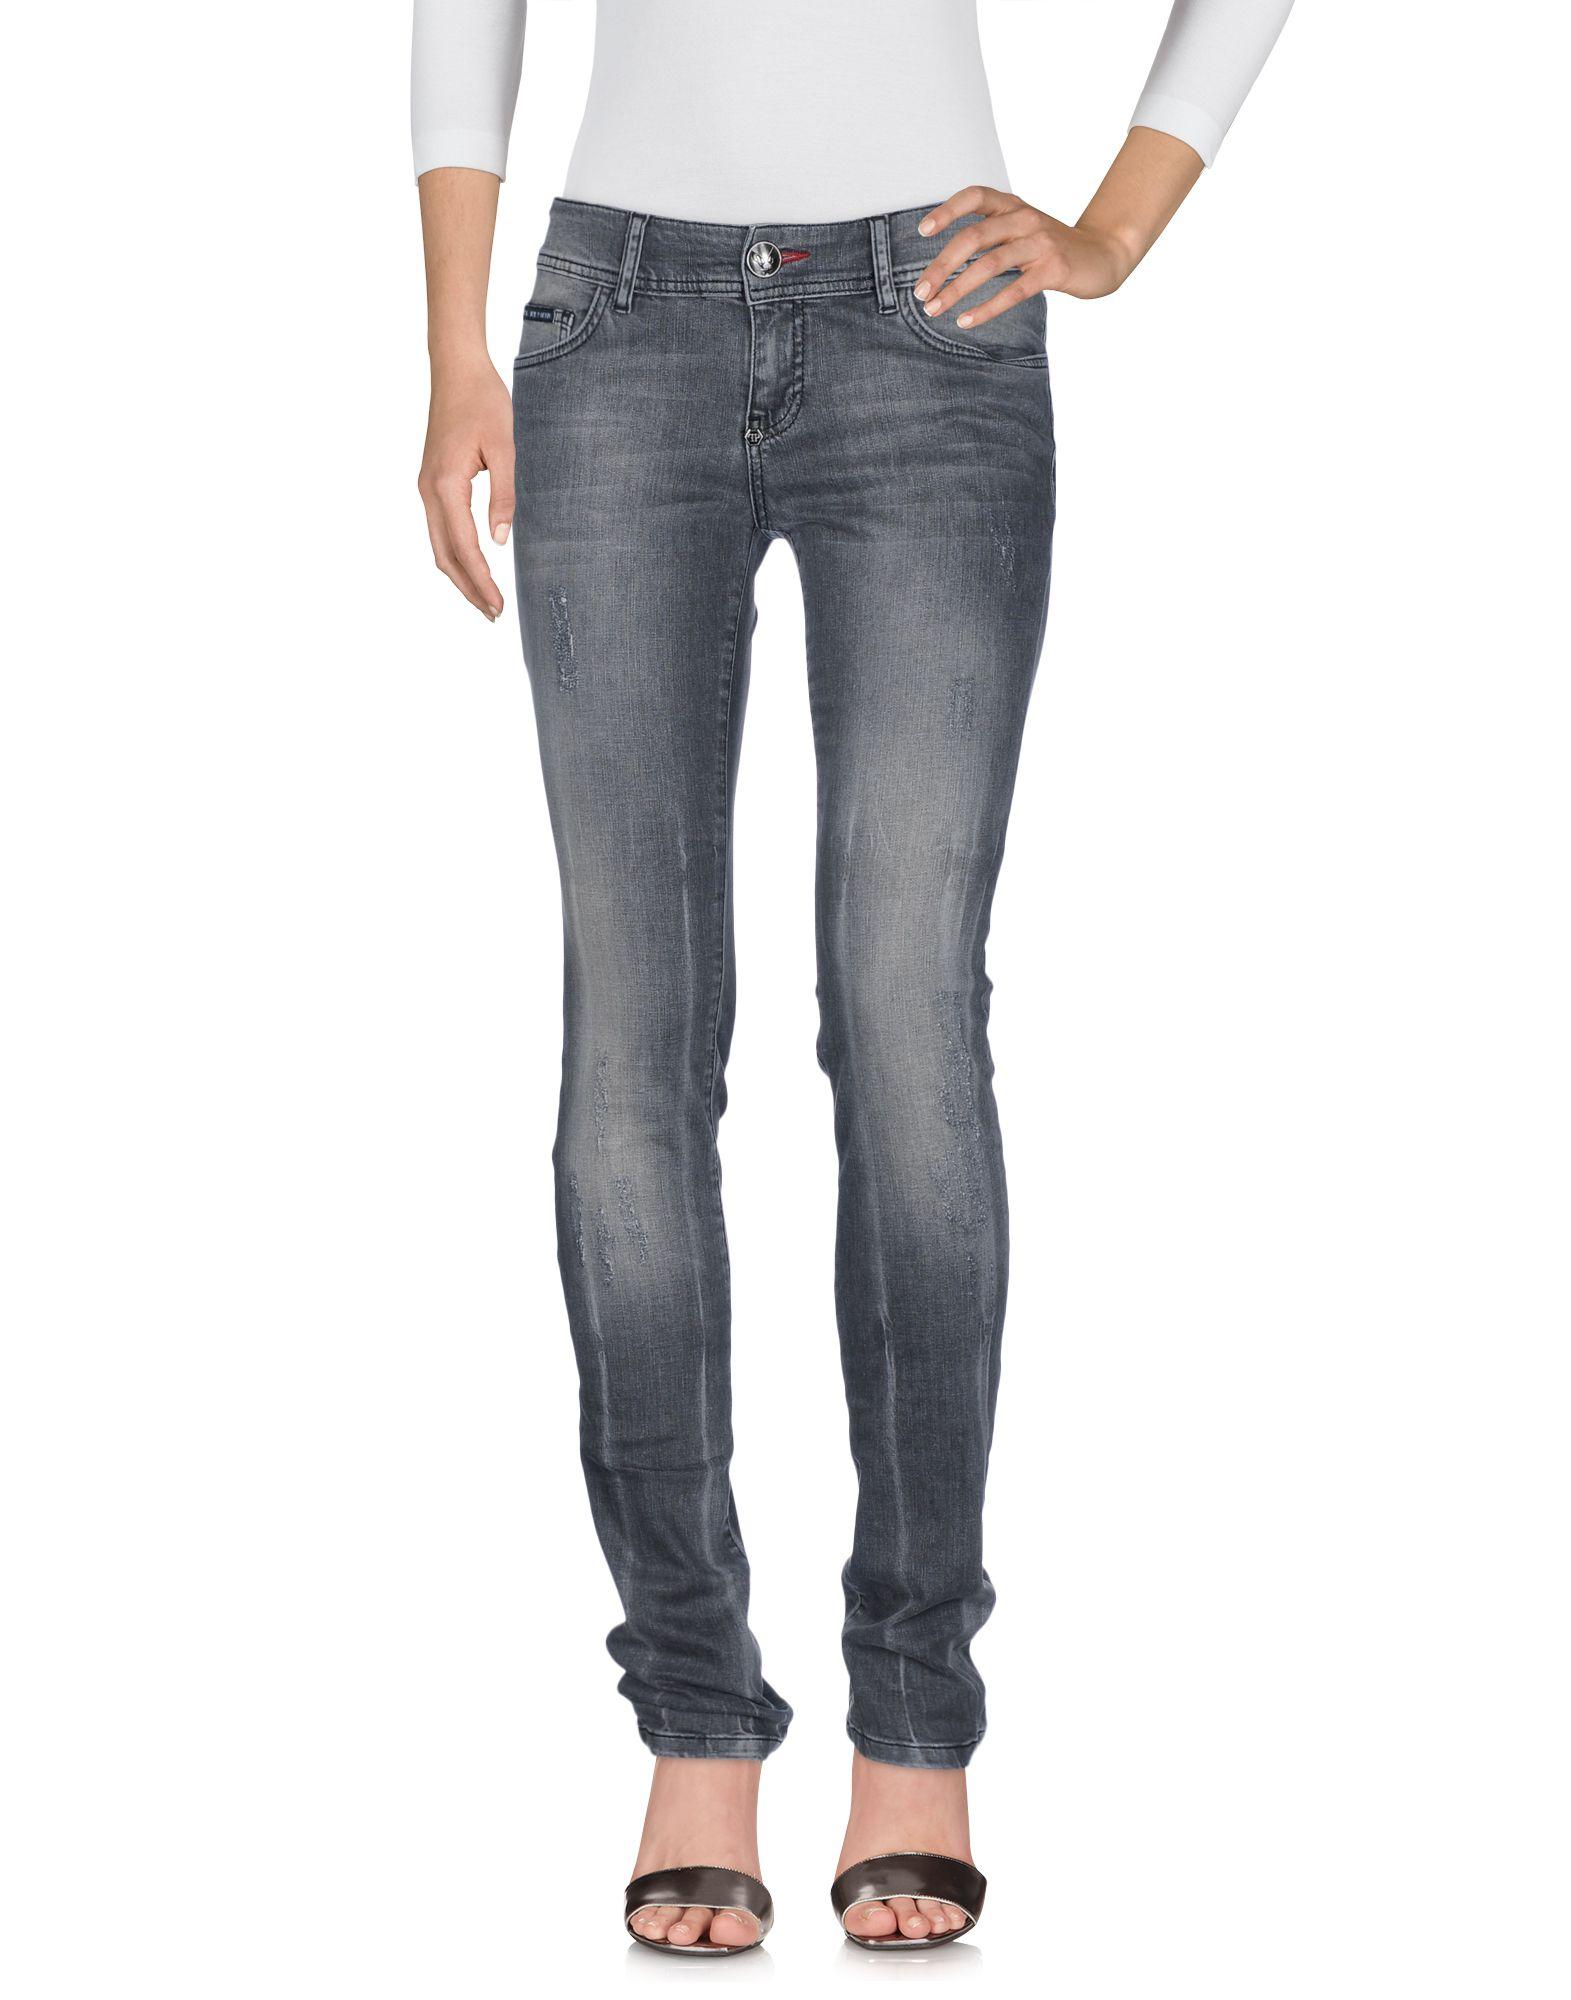 PHILIPP PLEIN Damen Jeanshose Farbe Blei Größe 7